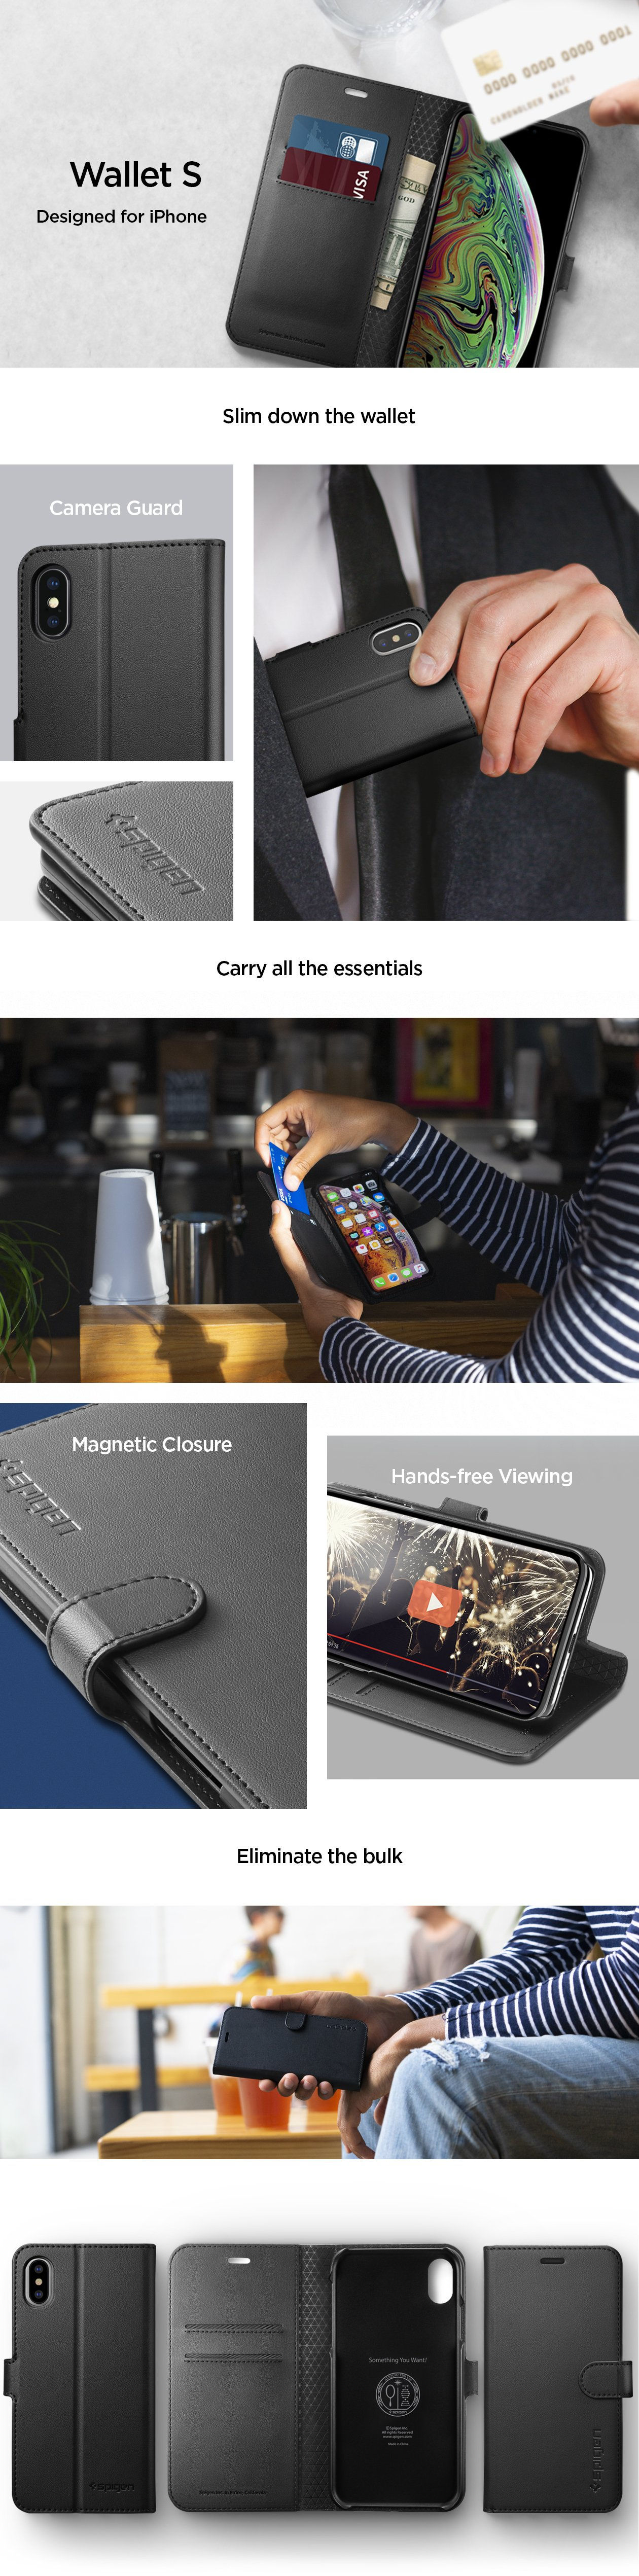 Carcasa Spigen iPhone XS Max Wallet S, Gohub